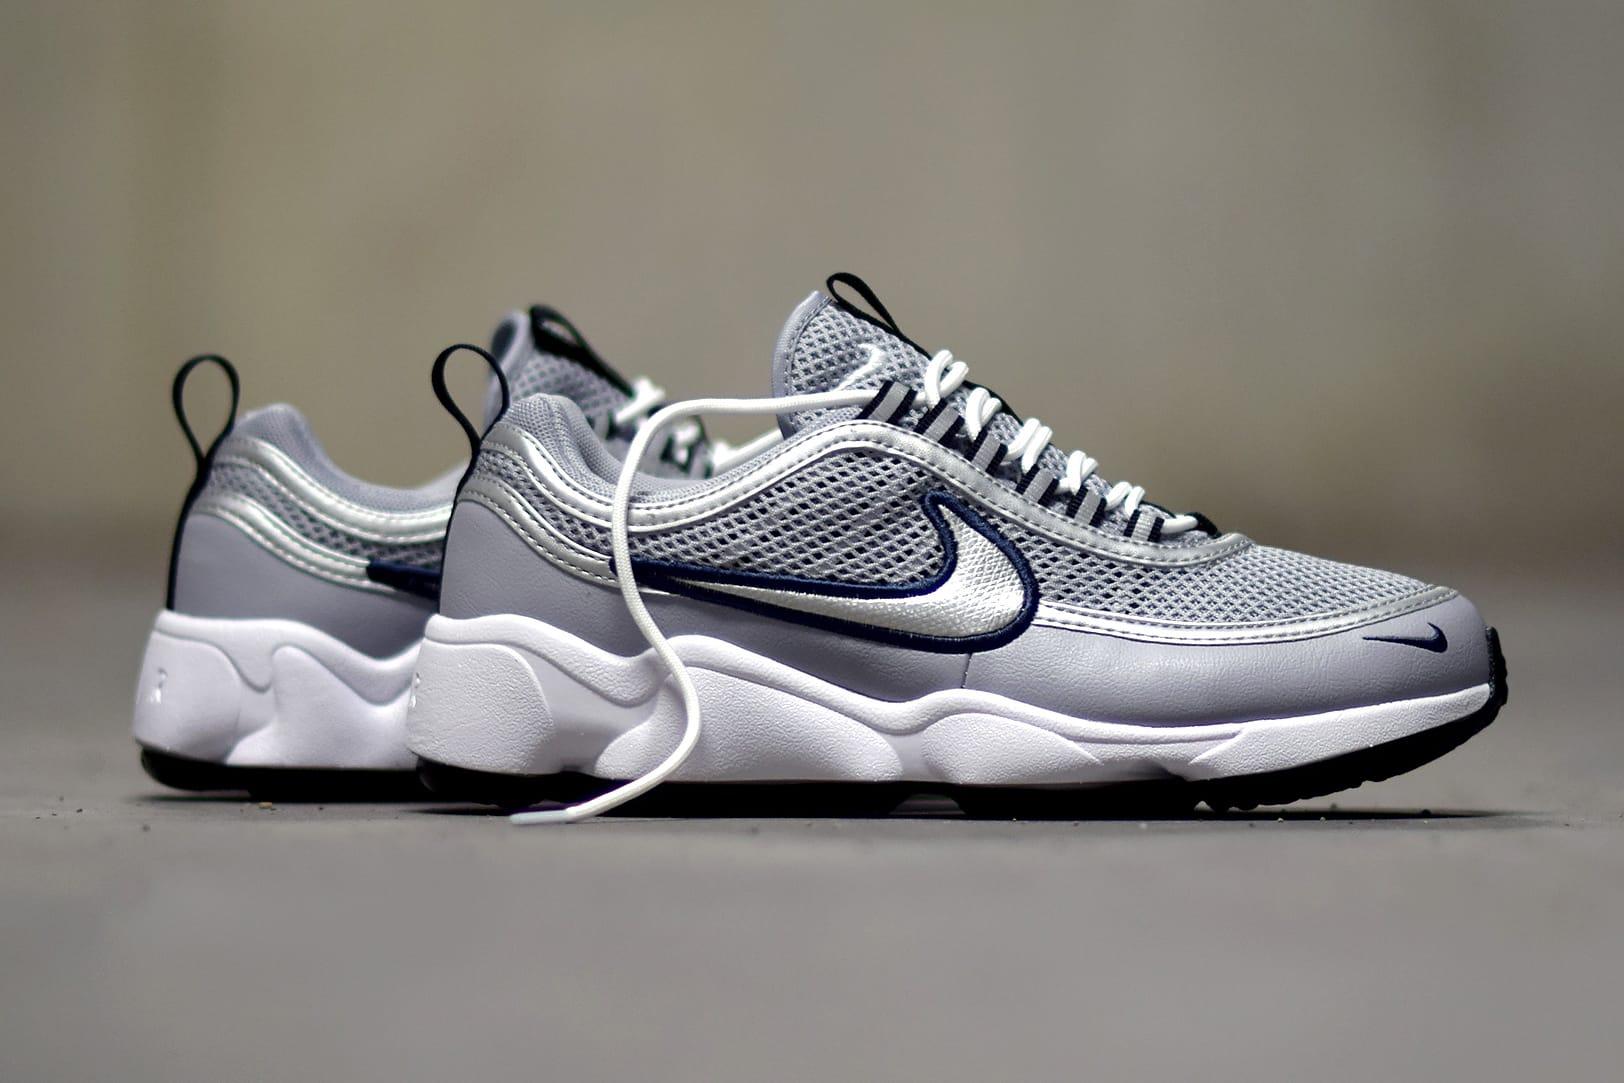 Nike Releases Women's Air Zoom Spiridon